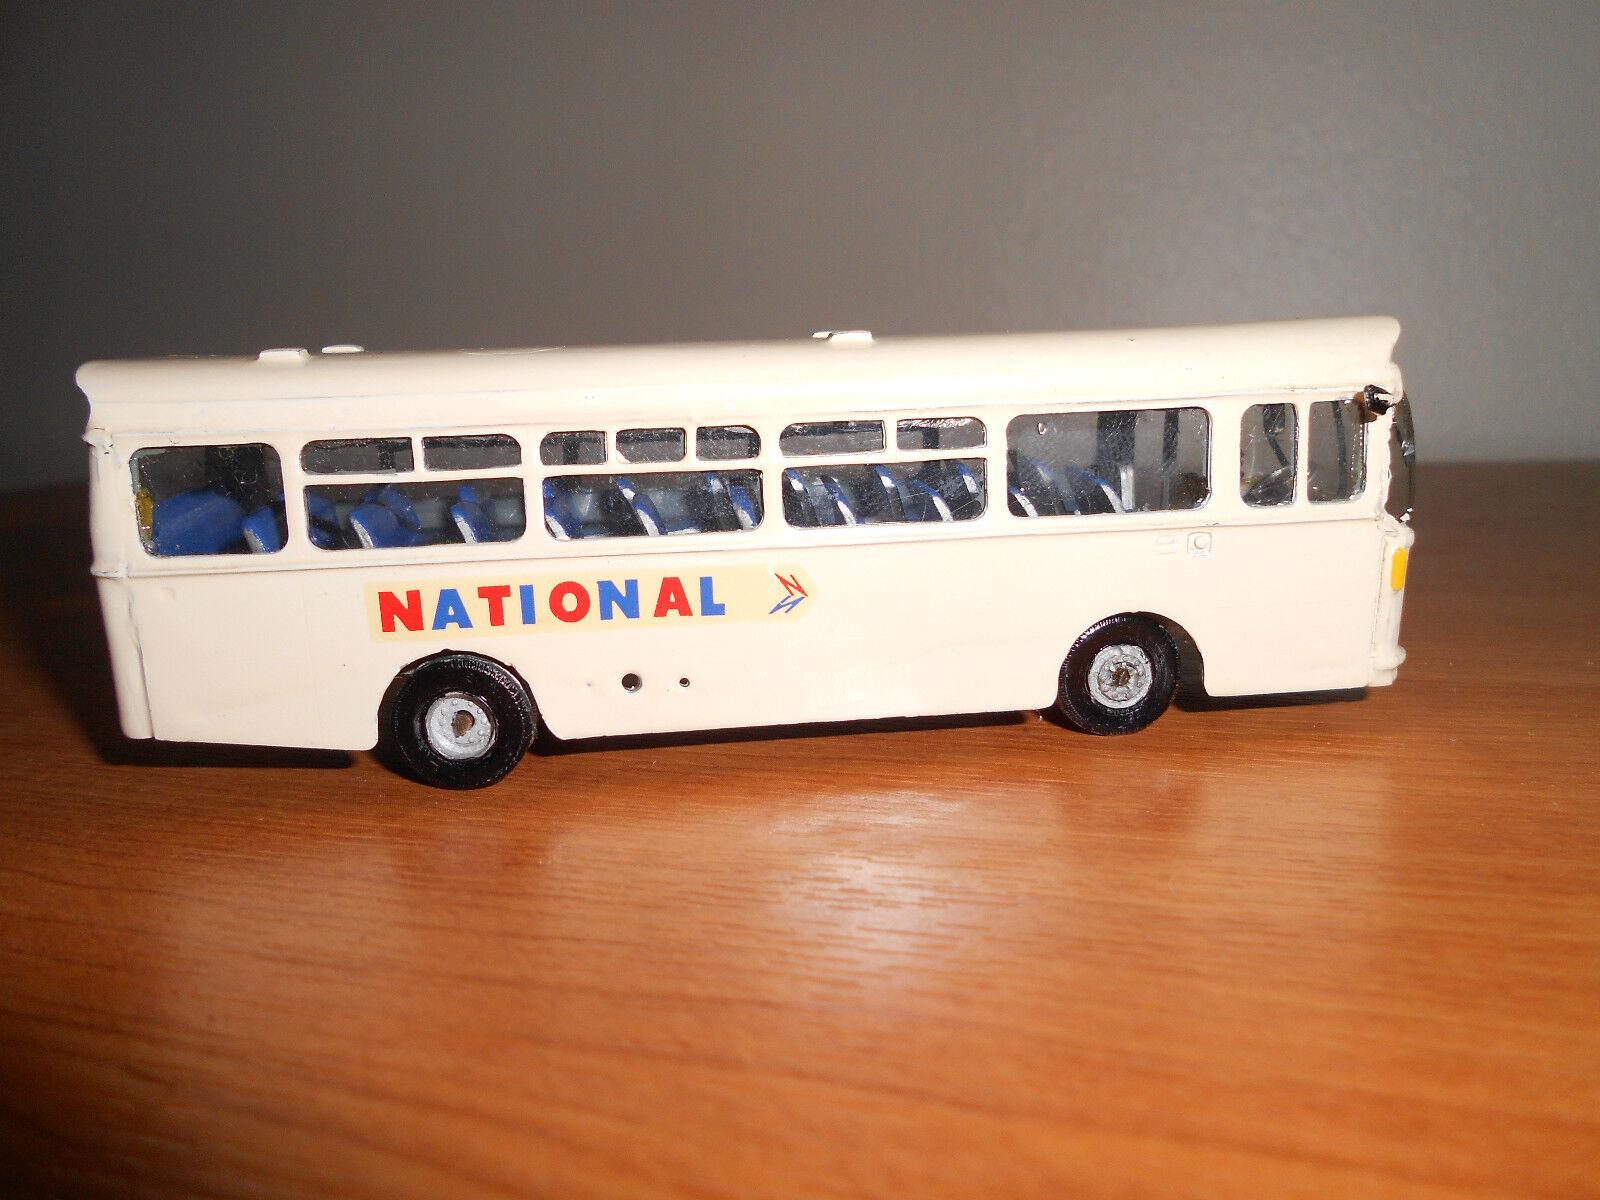 Westward Bristol LH Kit Kit Kit de bus de metal blancoo Nacional Ecw construido 07d644